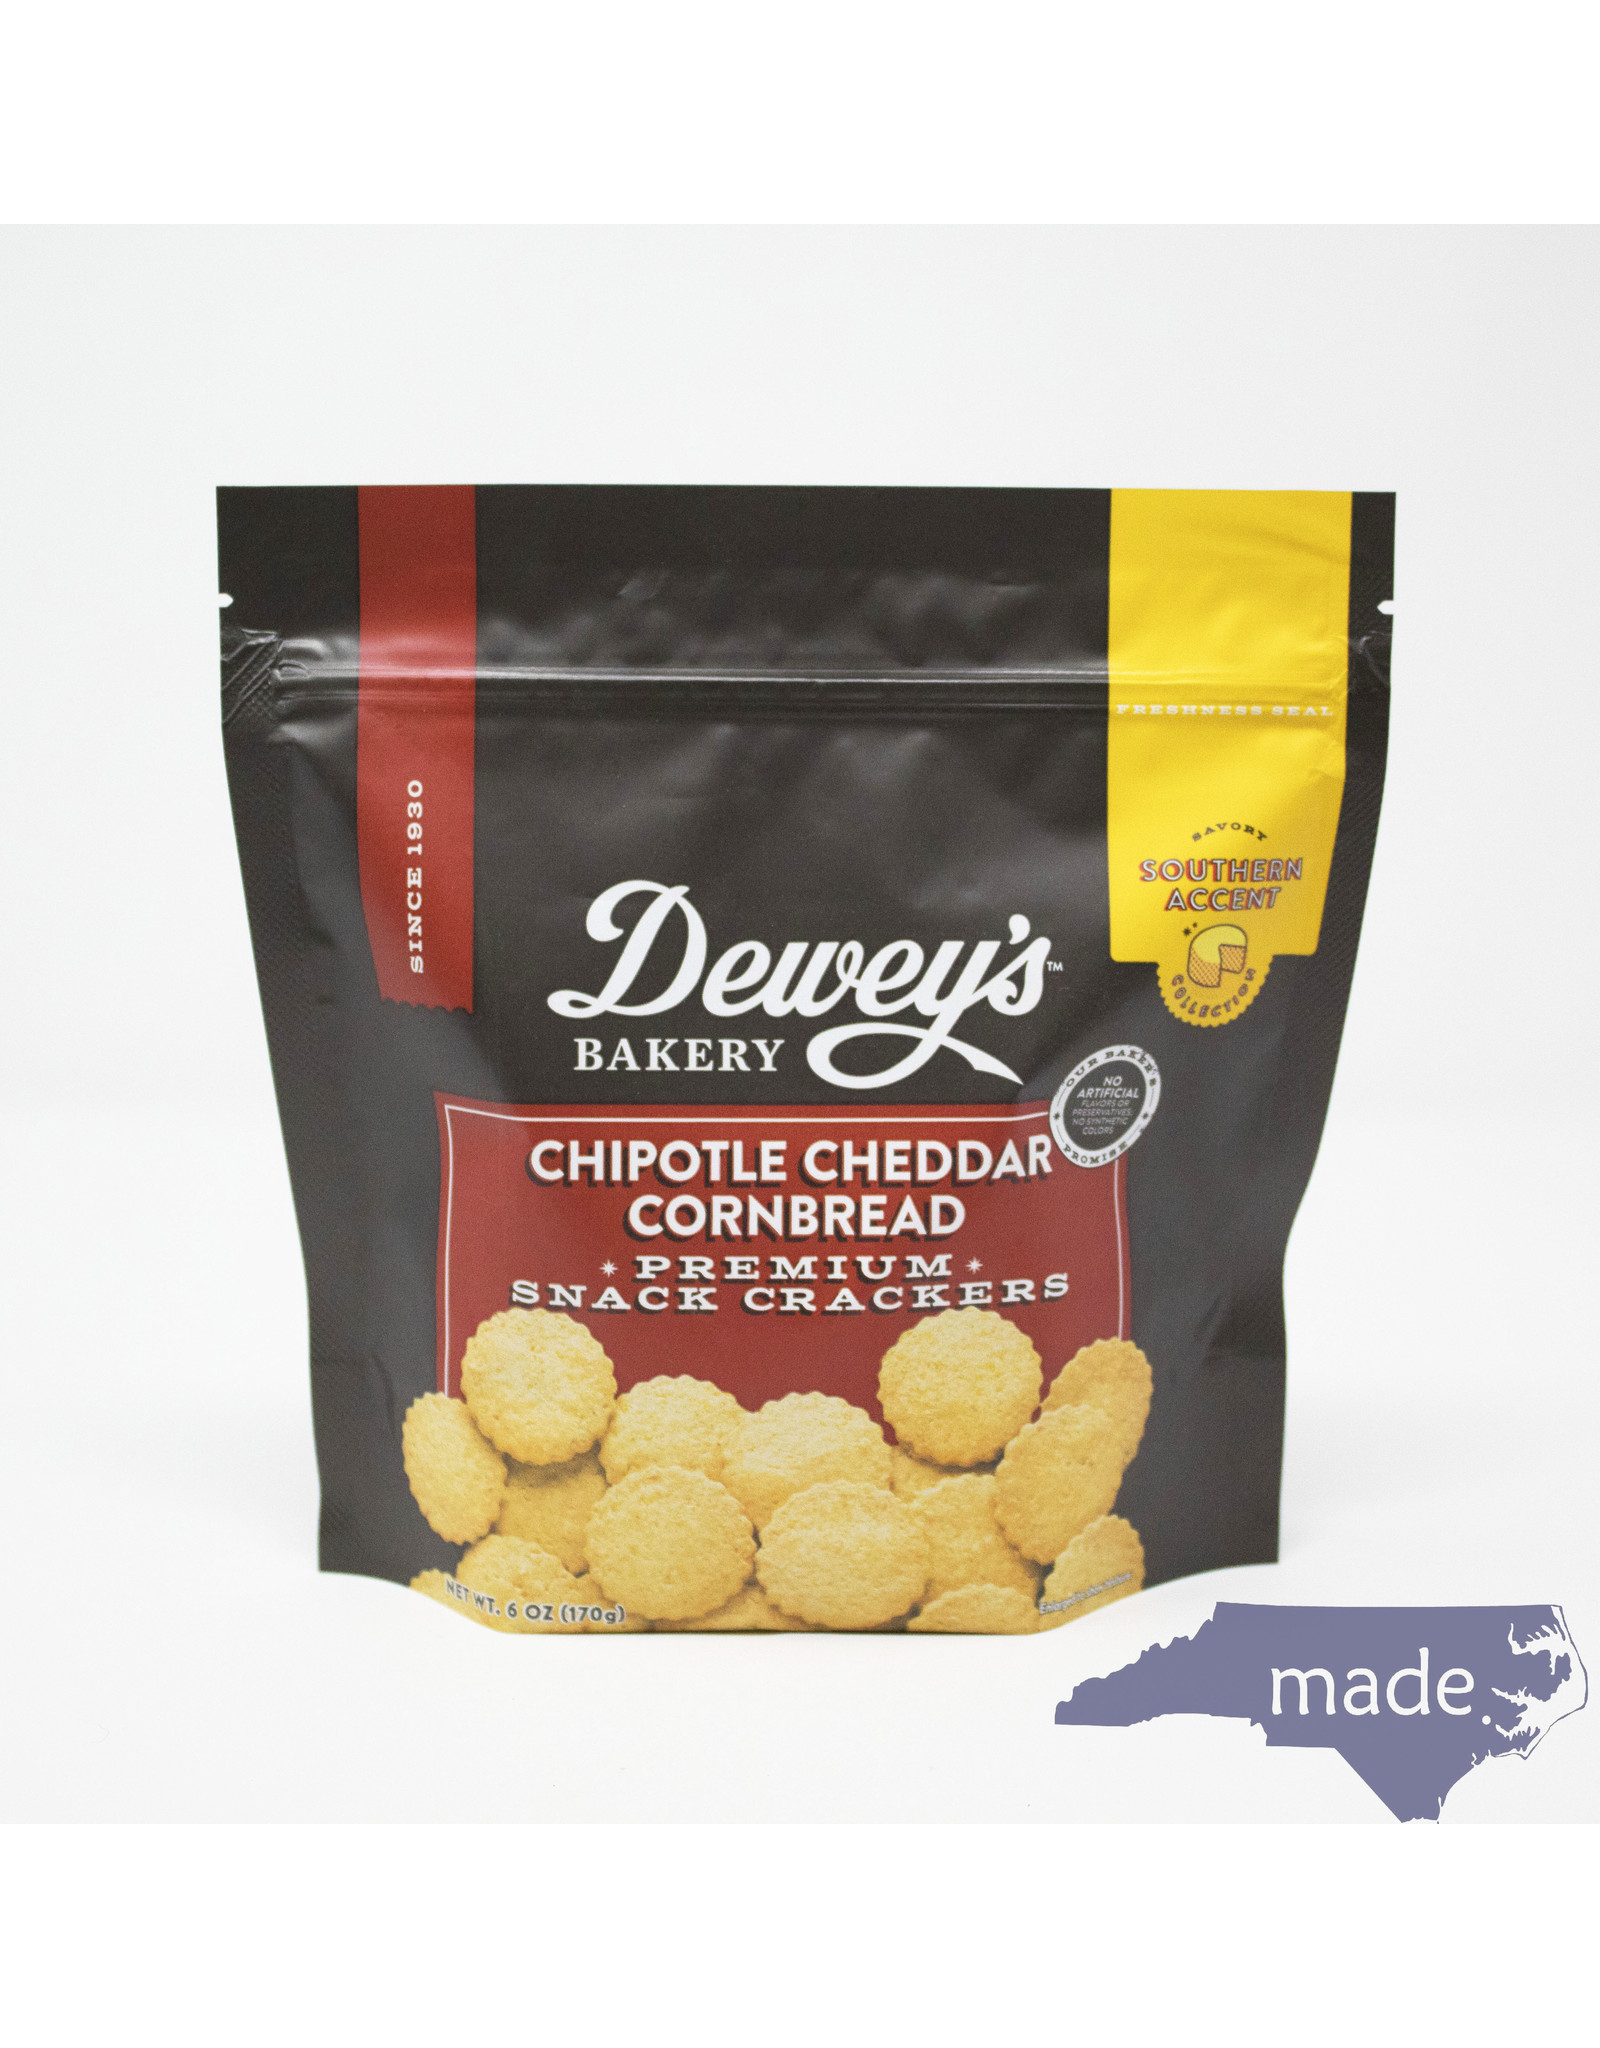 Dewey's Bakery Chipotle Cheddar Cornbread Crackers - Dewey's Bakery